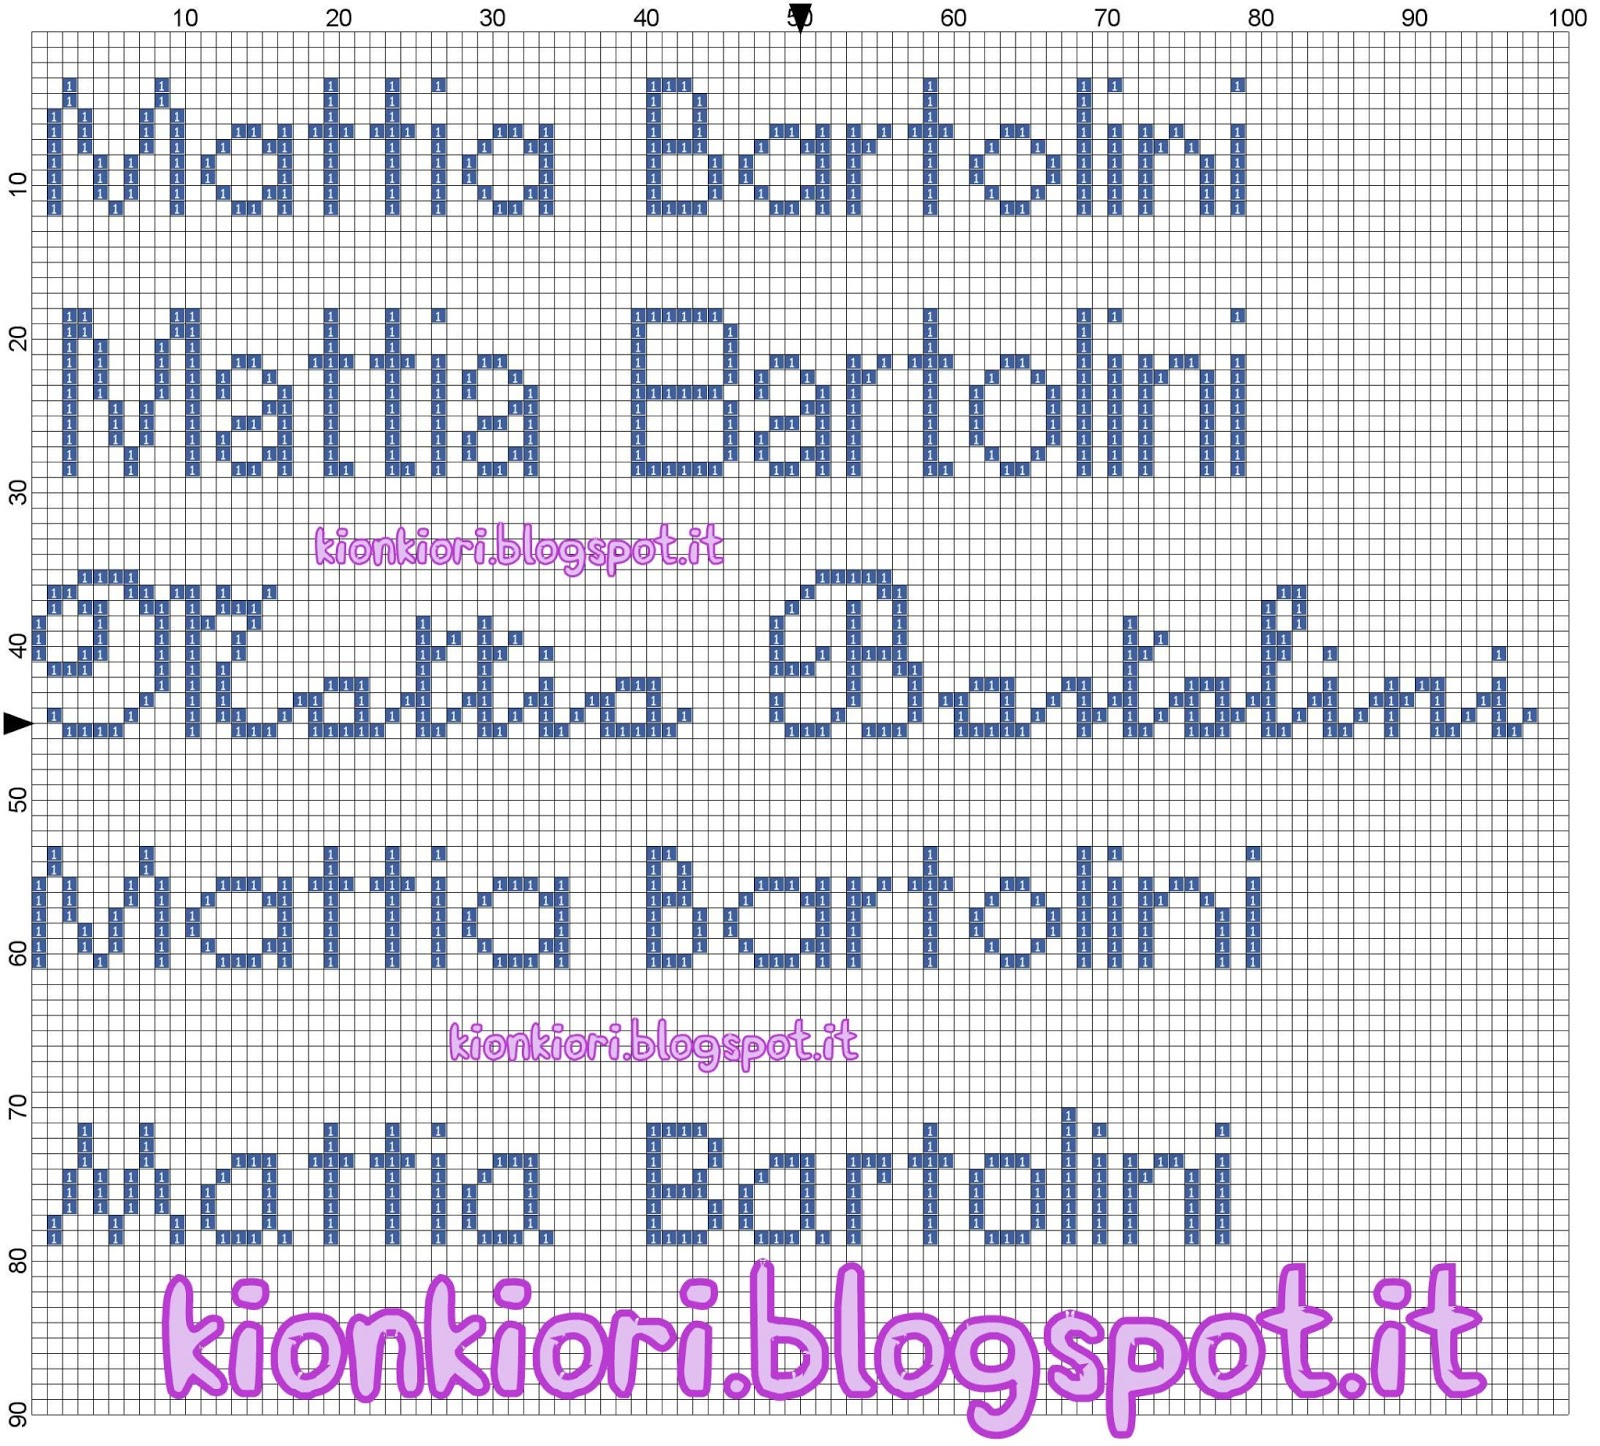 Popolare KIONKIORI Punto Croce: Myriam, Viola, Mattia, Ginevra MX59